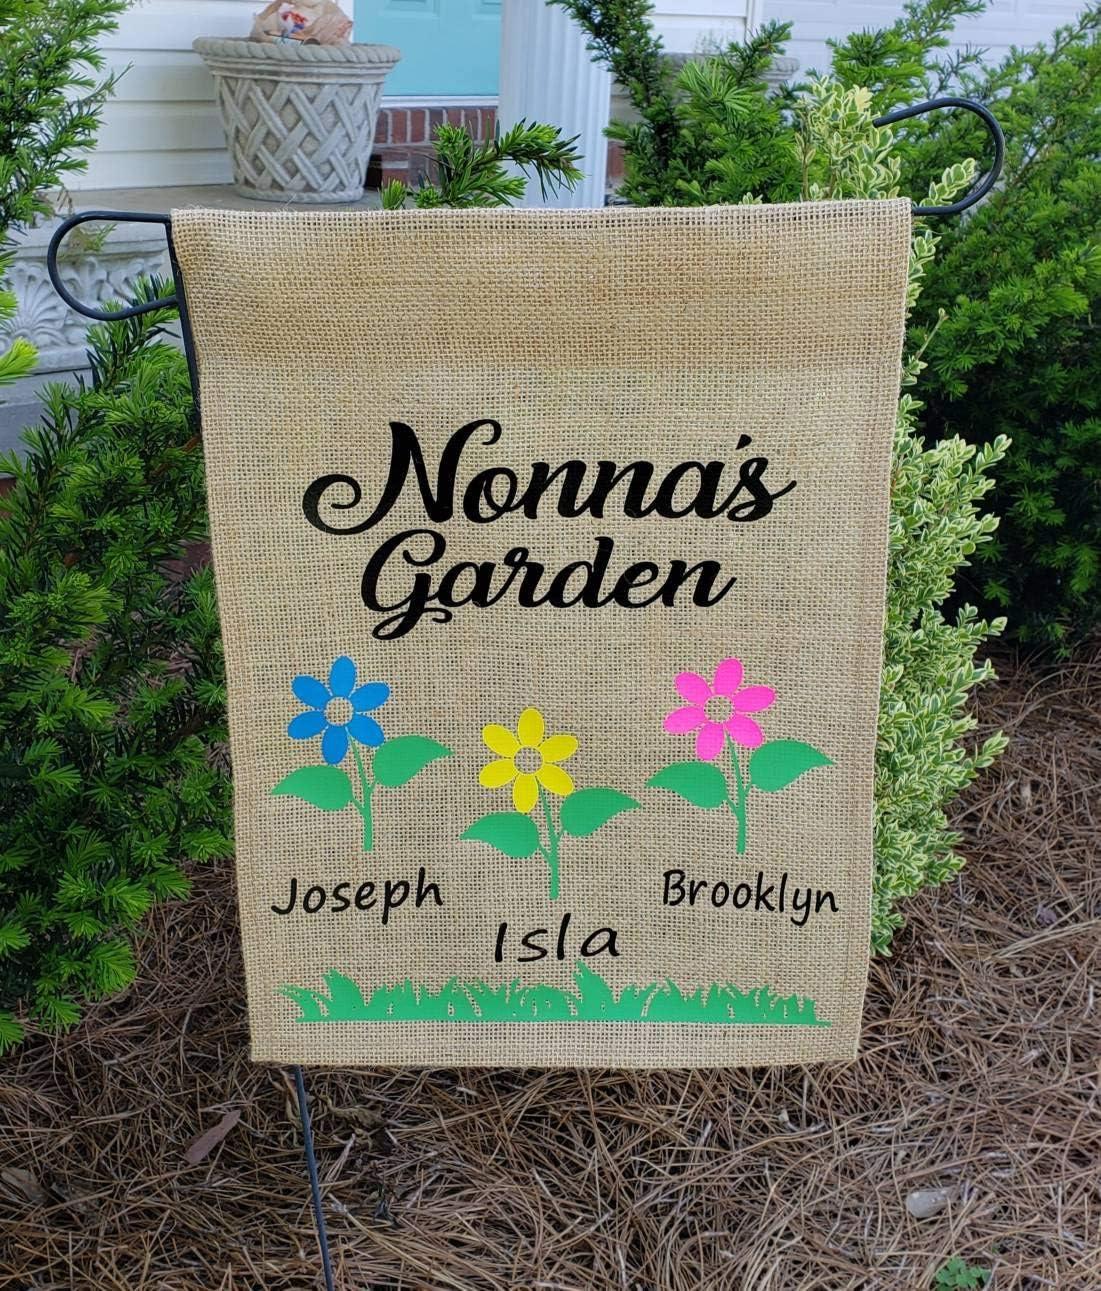 NicePodLLC Personalized Garden Flag-Gigi/Nonnas/Mimi/Mom/Nana/Grandma/Mum/Mawmaw Garden Burlap Flag with Grandkid Names-Mothers Day-Grandparent Gift-Summer Decor-Flower Garden-Perfect